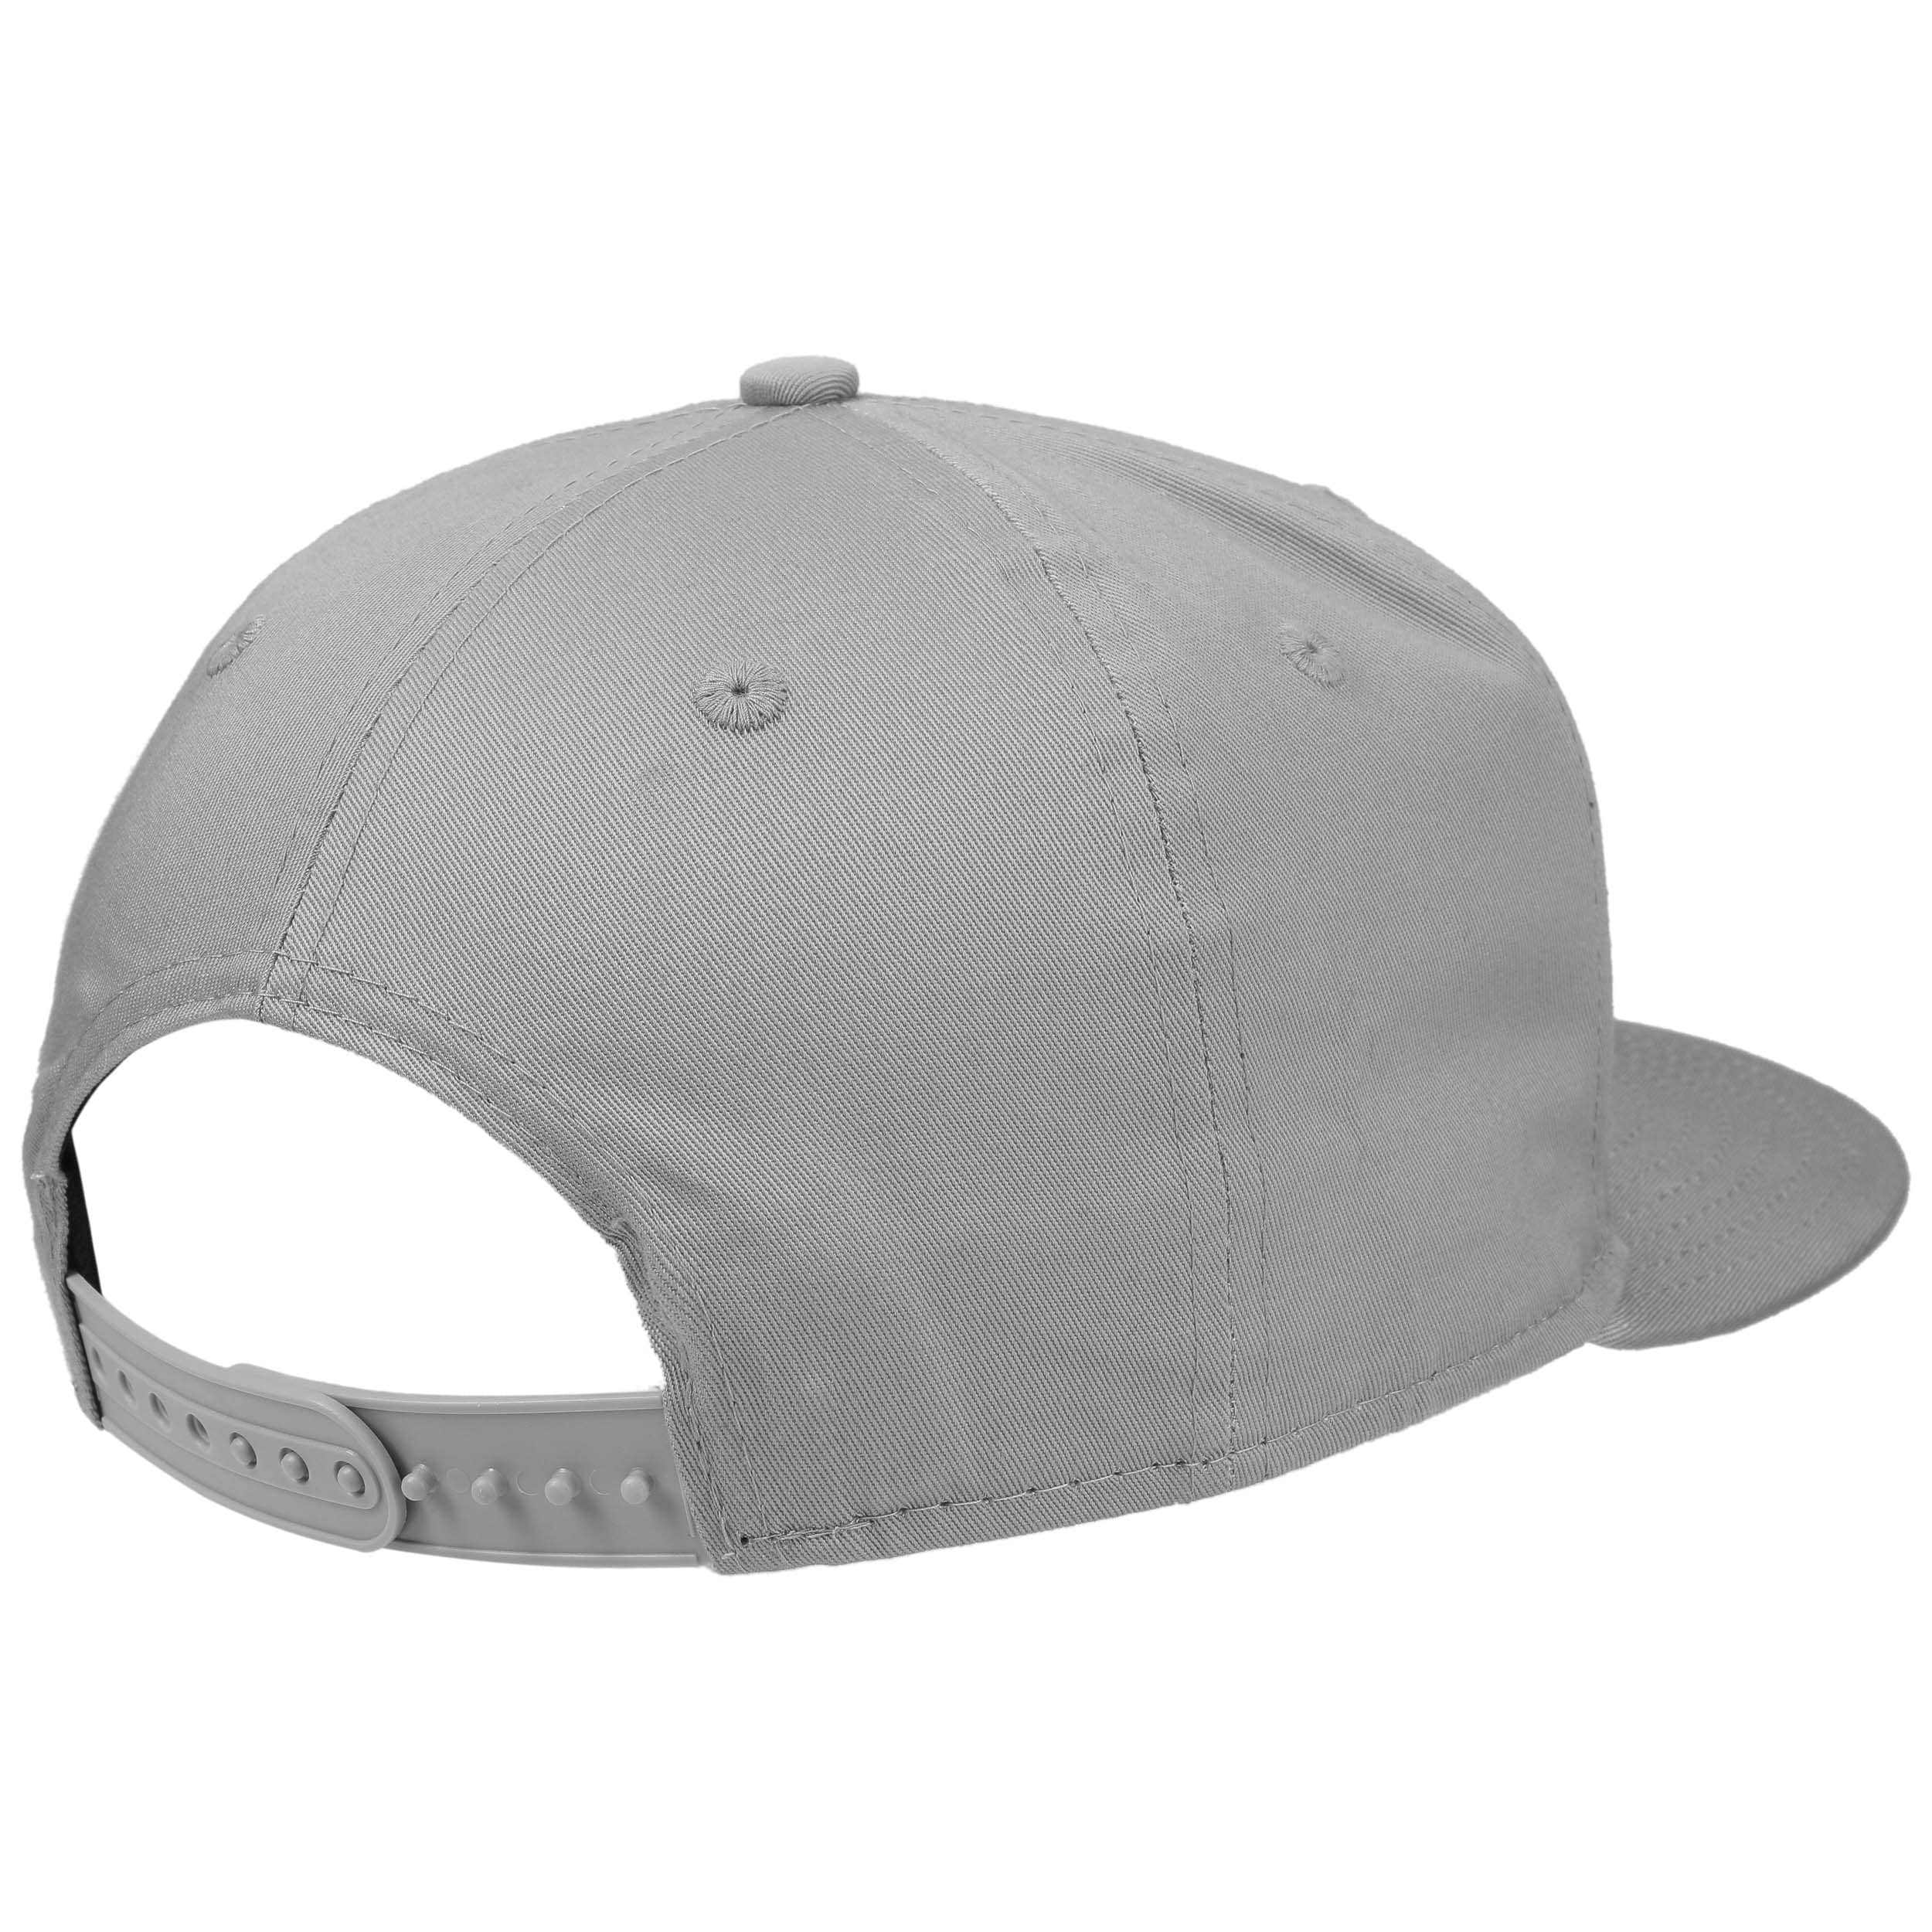 ... rosso bordeaux 3 · Cappellino 9Fifty Ess Yankees by New Era - grigio  chiaro 1 ... 18ded52b9419